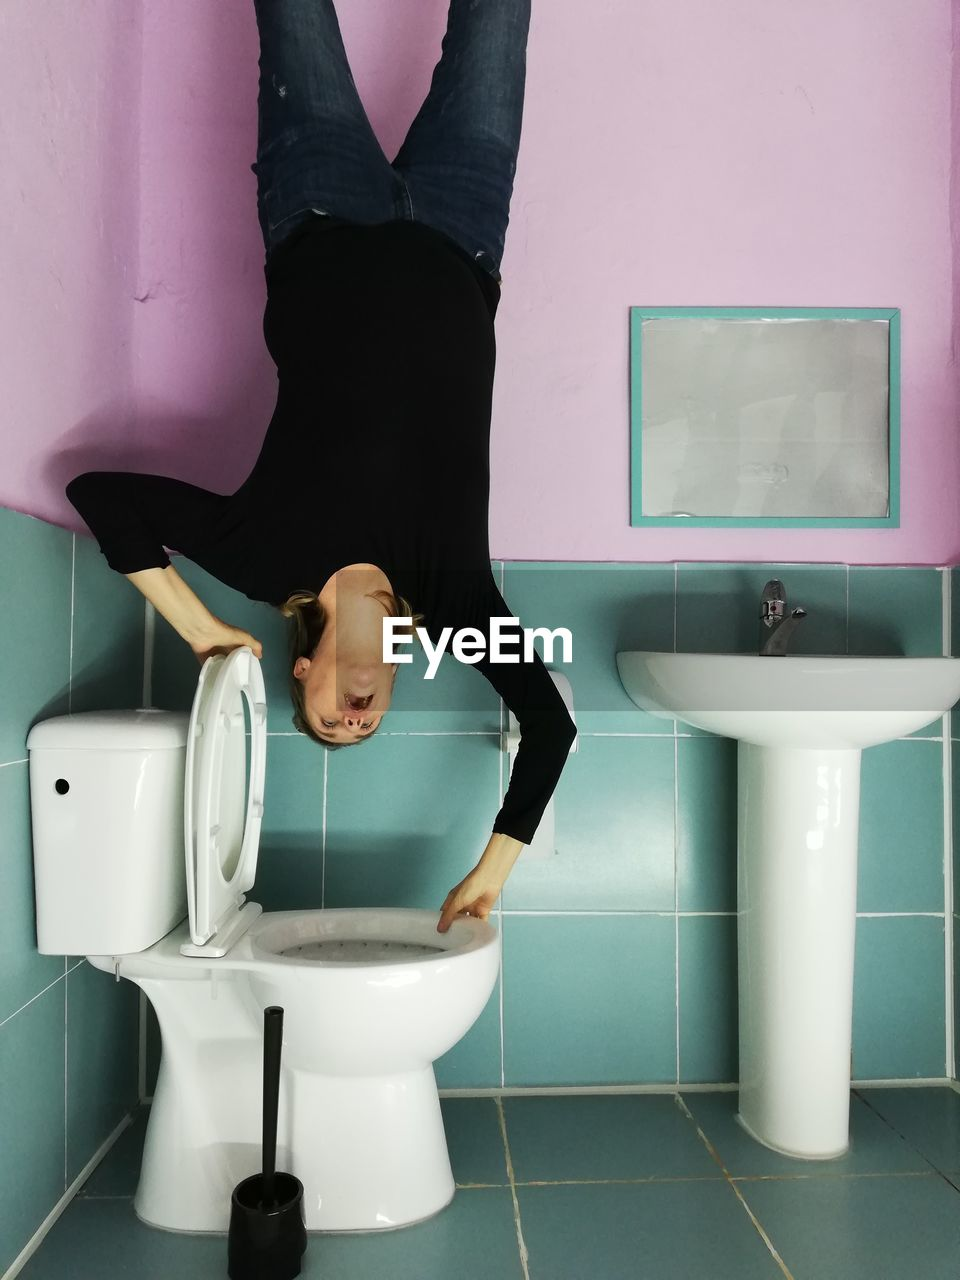 Woman upside down on toilet bowl in bathroom